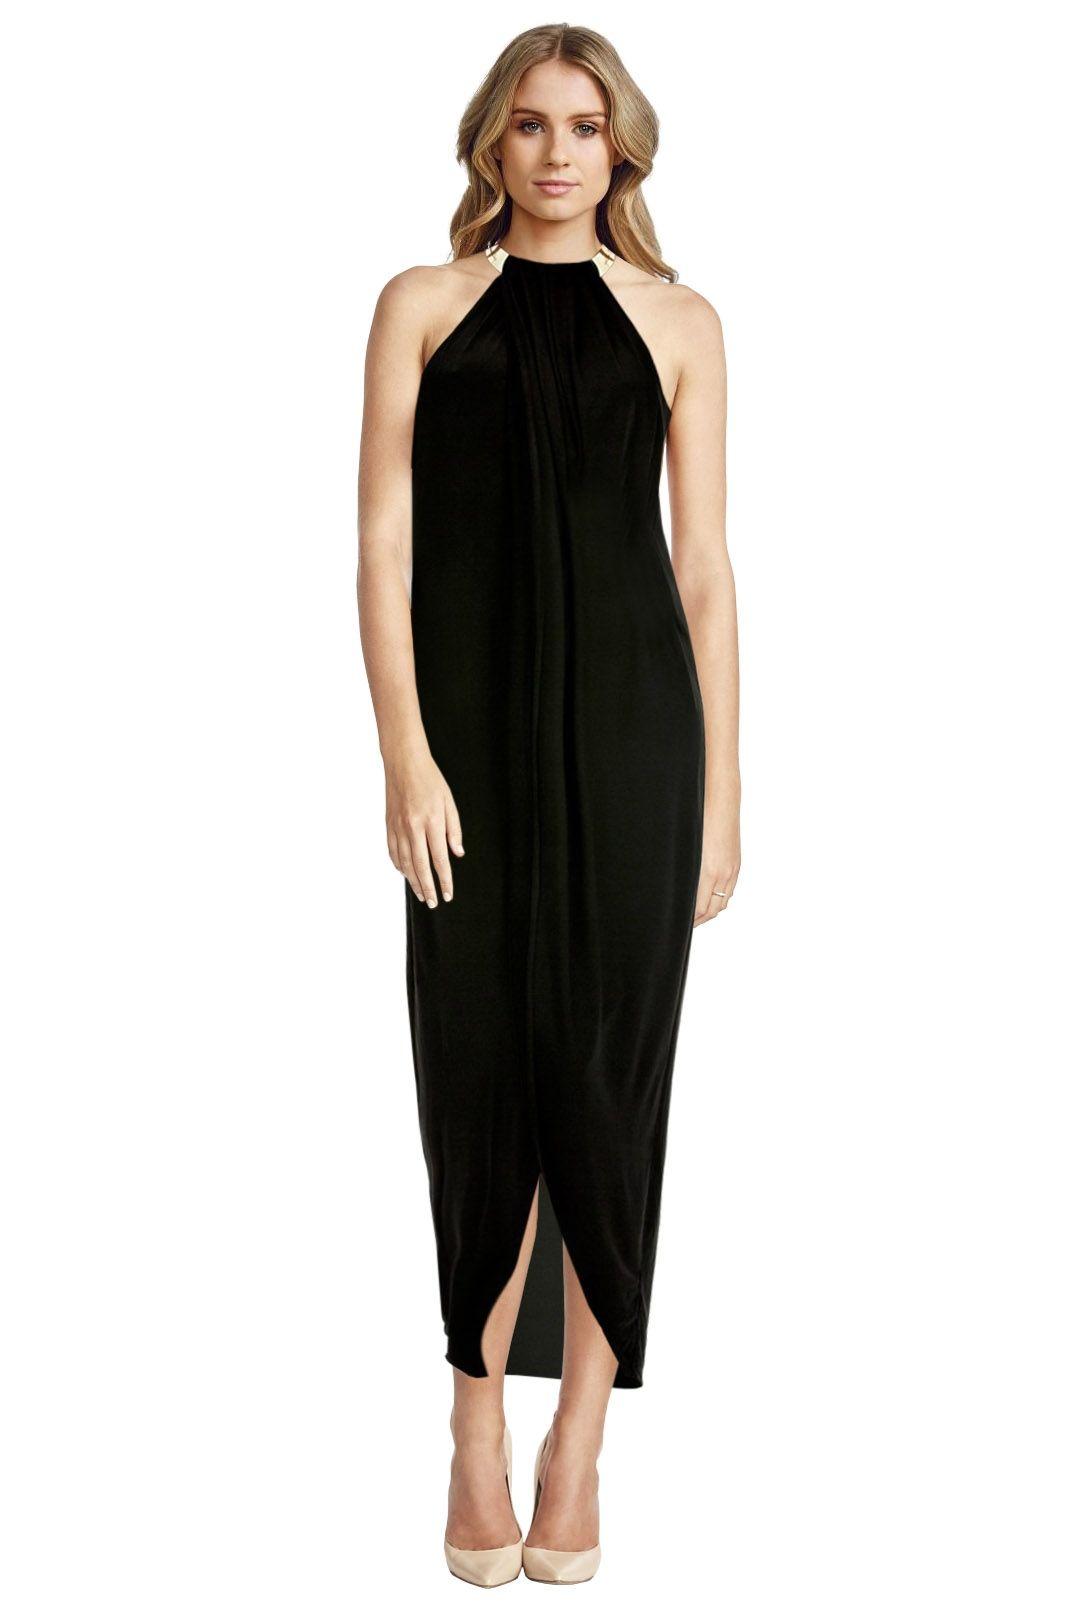 Langhem - Rianna Maxi Dress - Black - Front